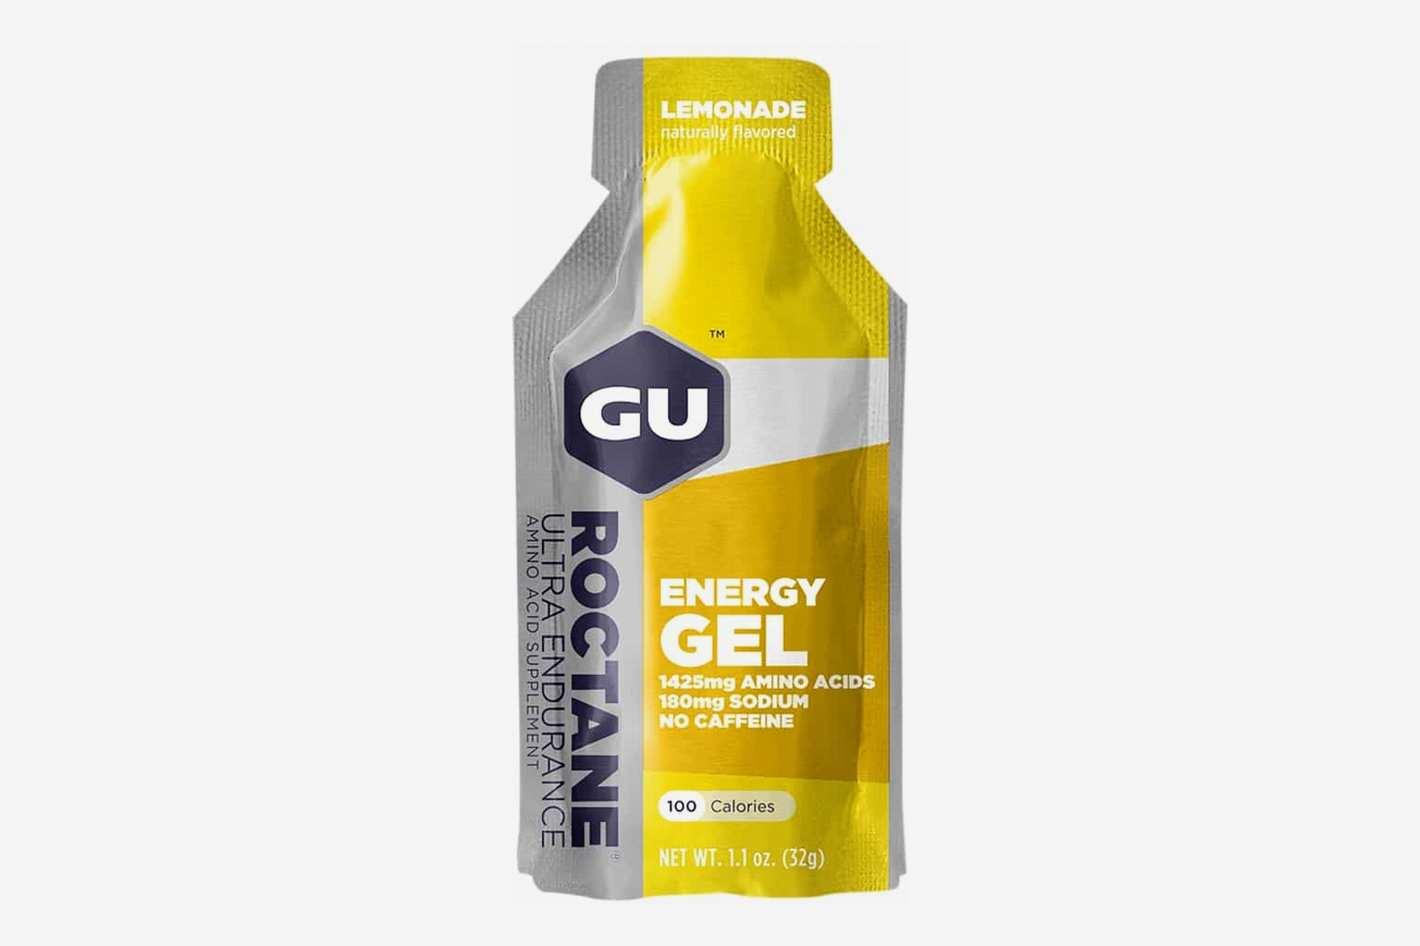 GU Roctane Sports Gel Lemonade